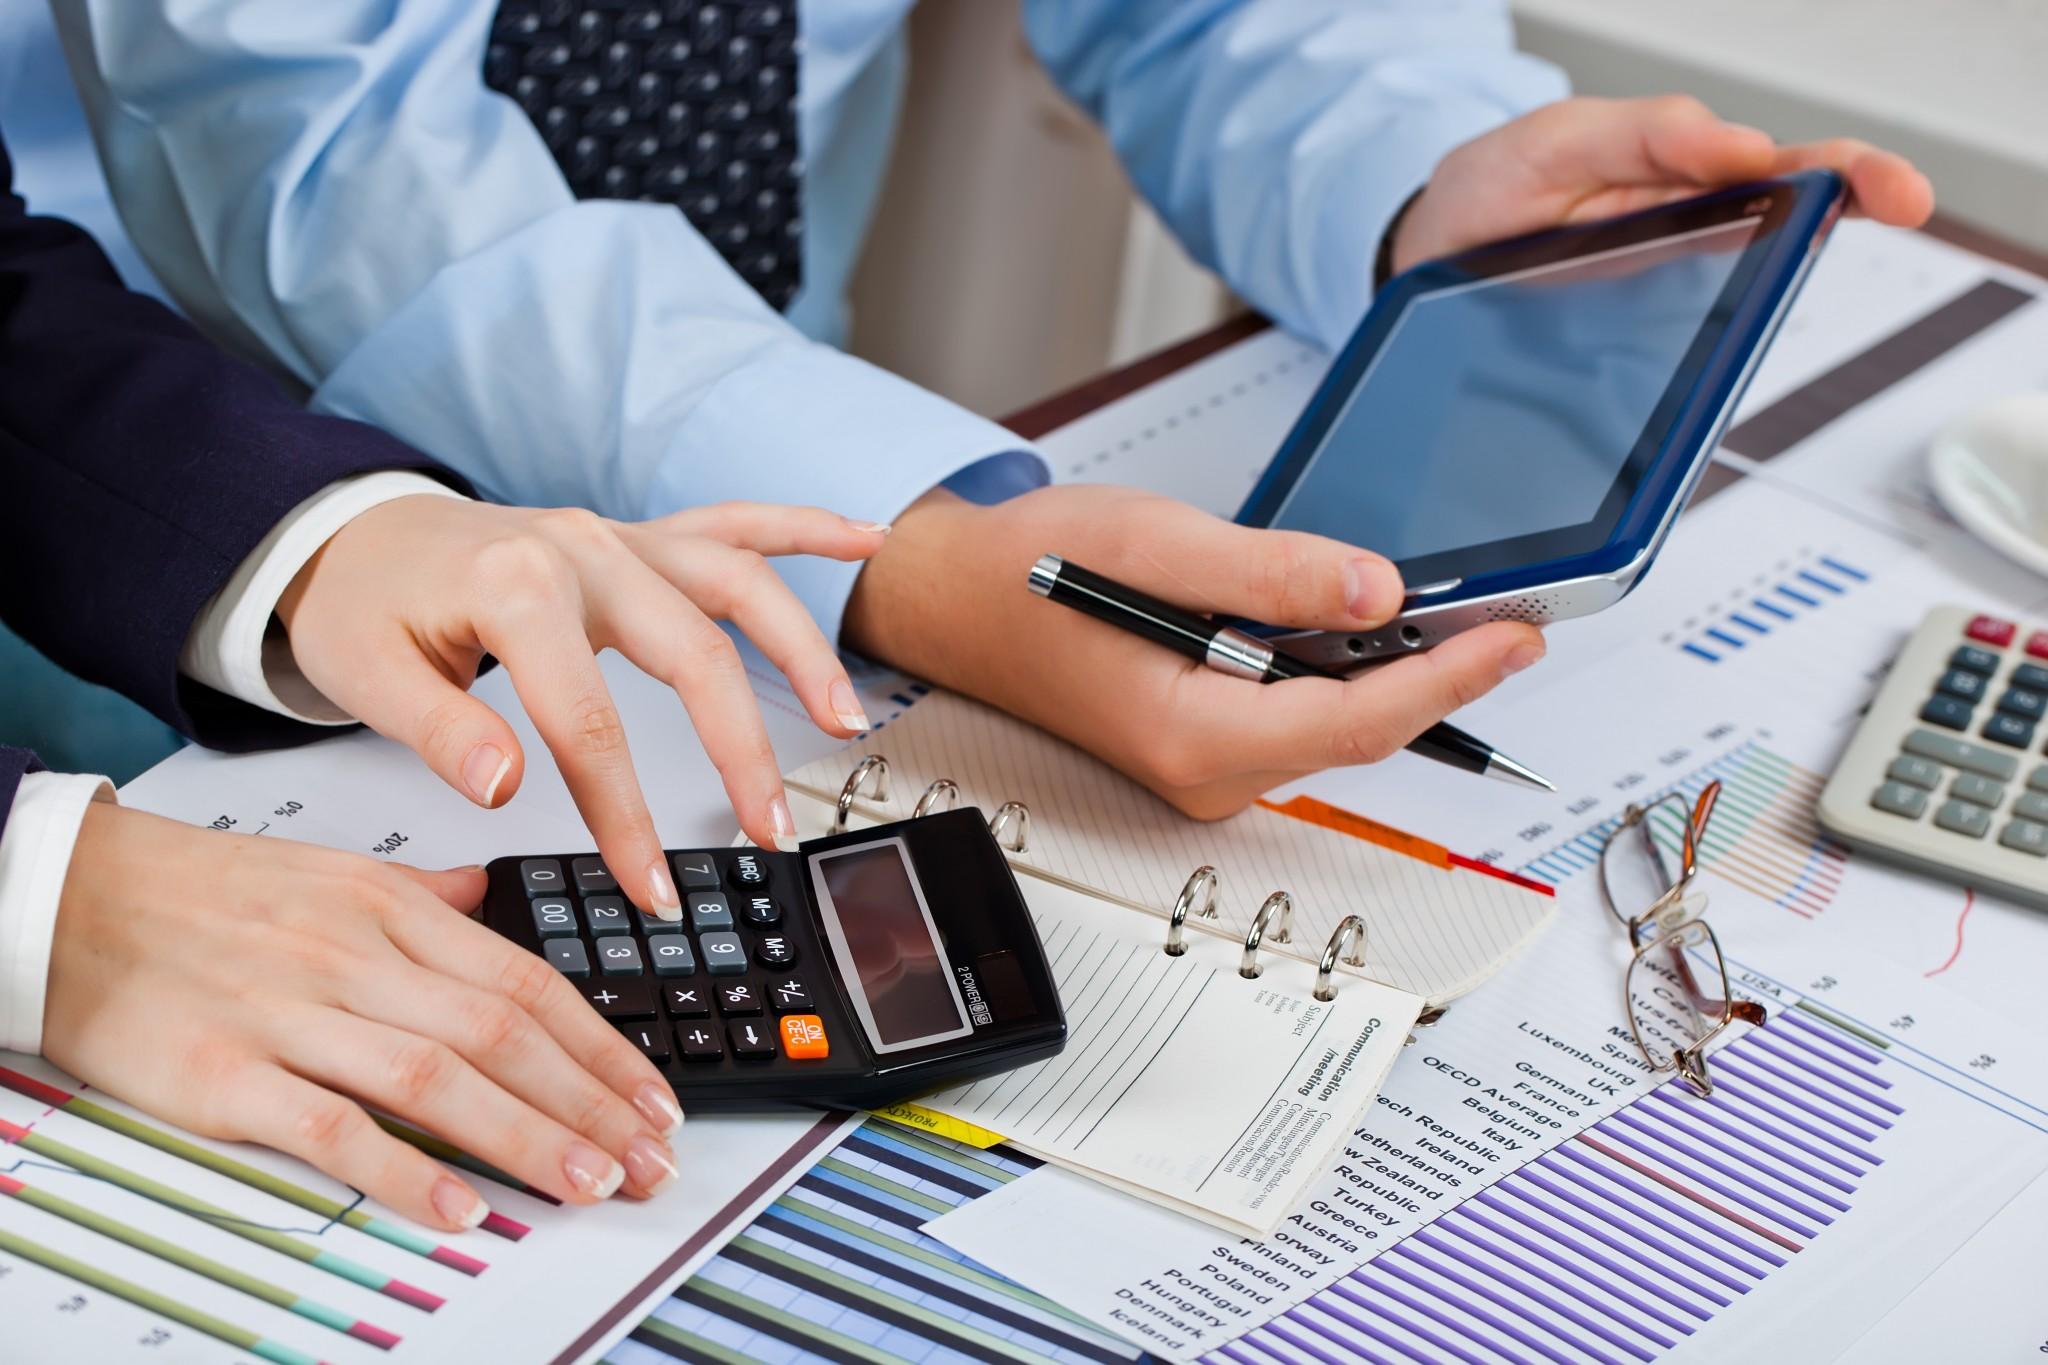 Бухгалтерское сопровождение ведение бухгалтерского учета бухгалтер ип москва